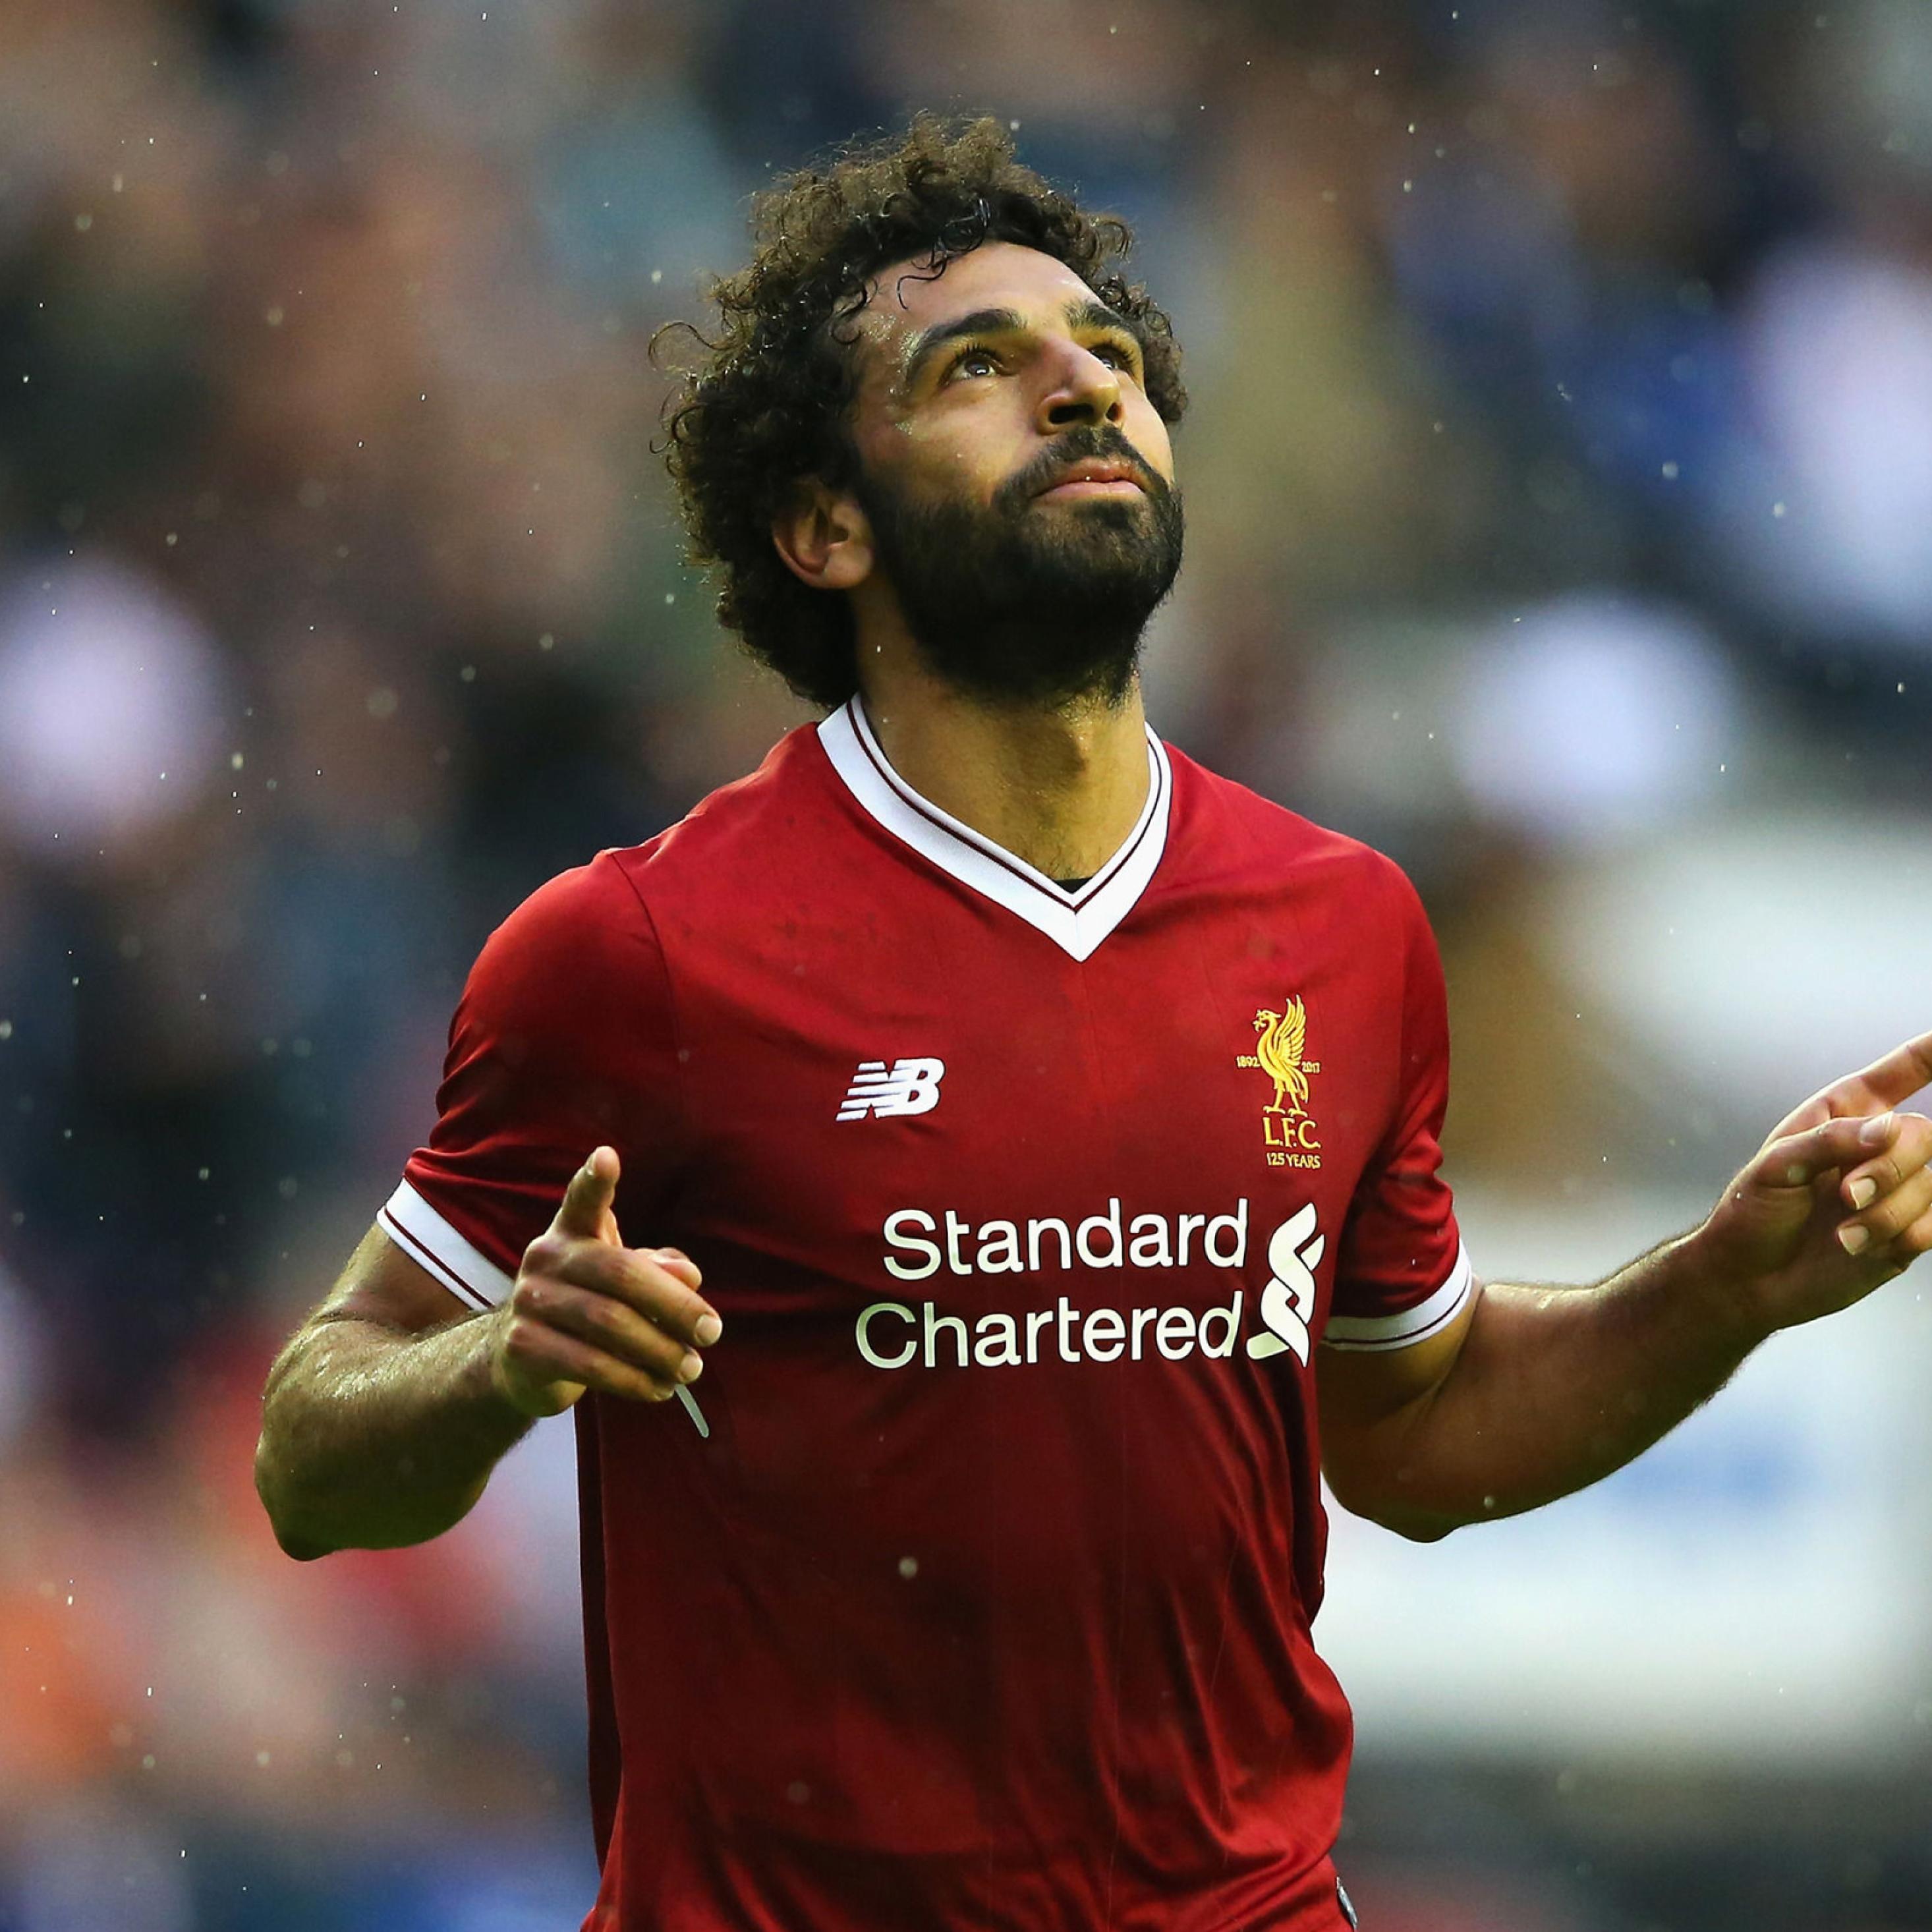 Mohamed Salah Liverpool And Egyptian Football Player, Full ...